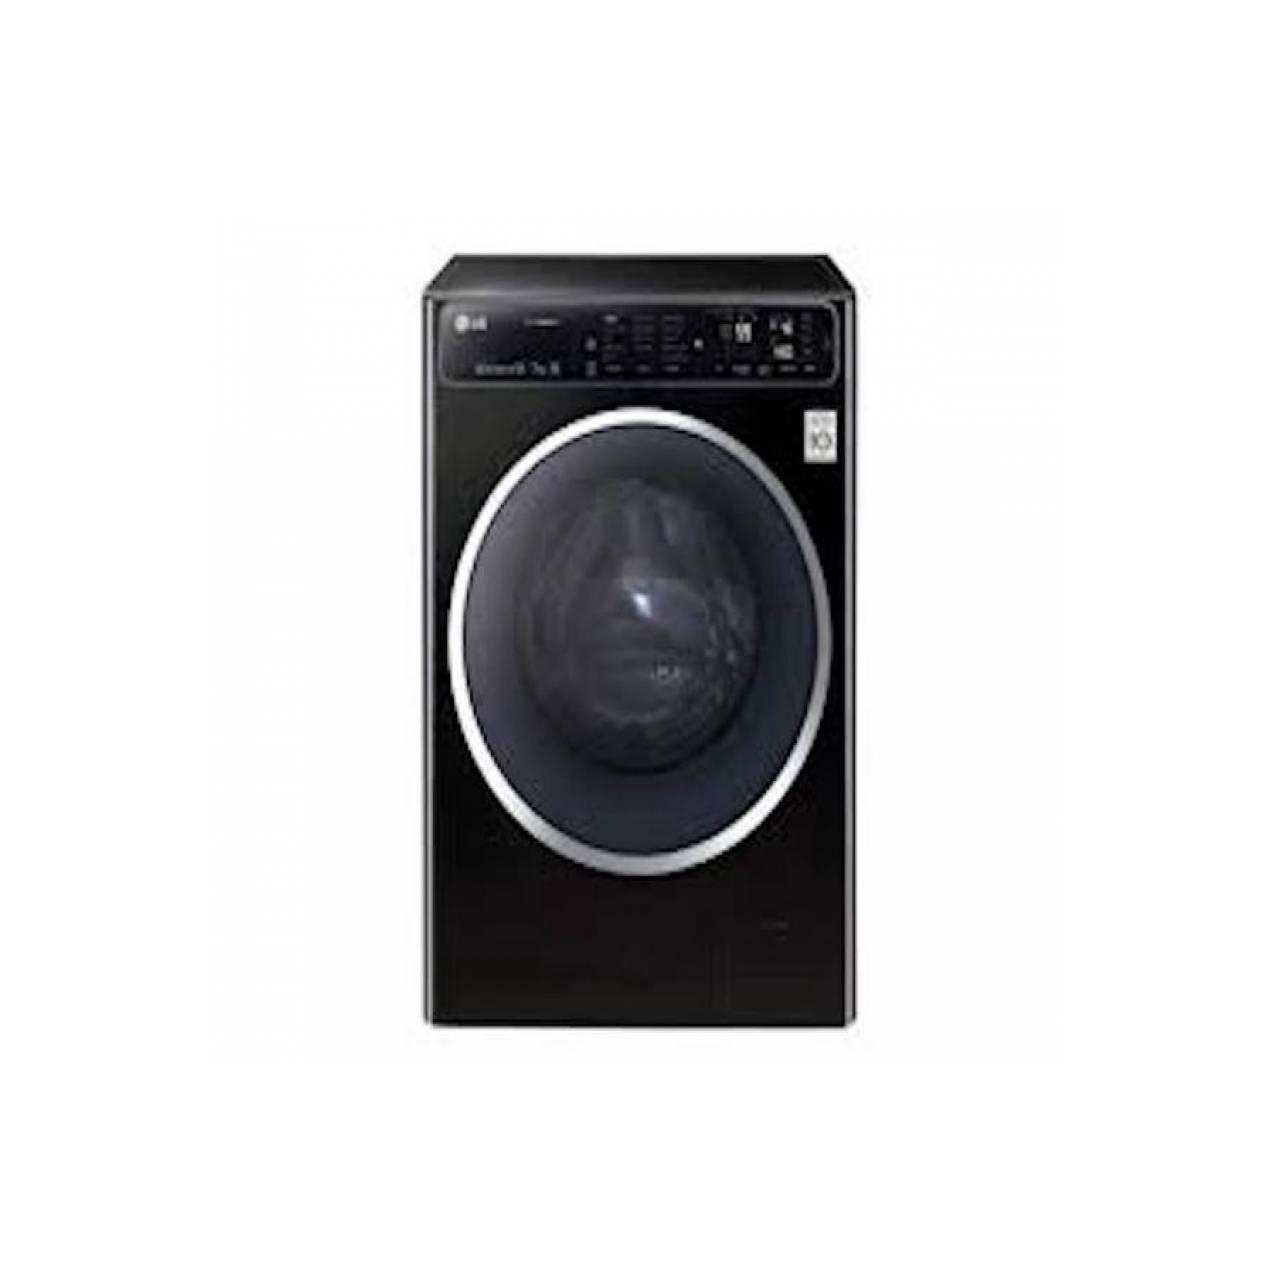 Mesin Cuci LG F1400HT1B 10kg Wash&Dry